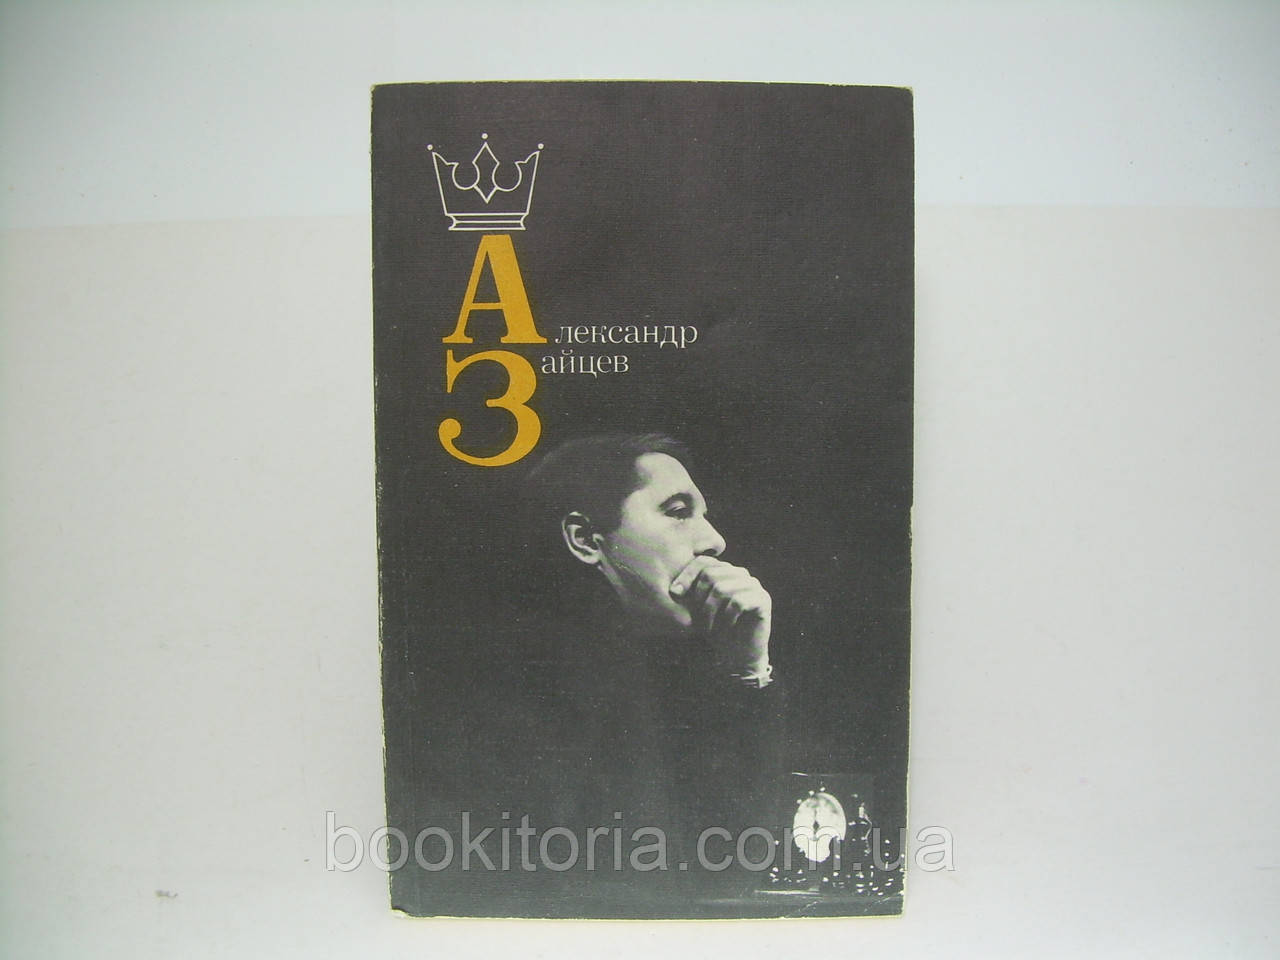 Архангельский Б.Н., Кимельфельд Р.И. Александр Зайцев (б/у).